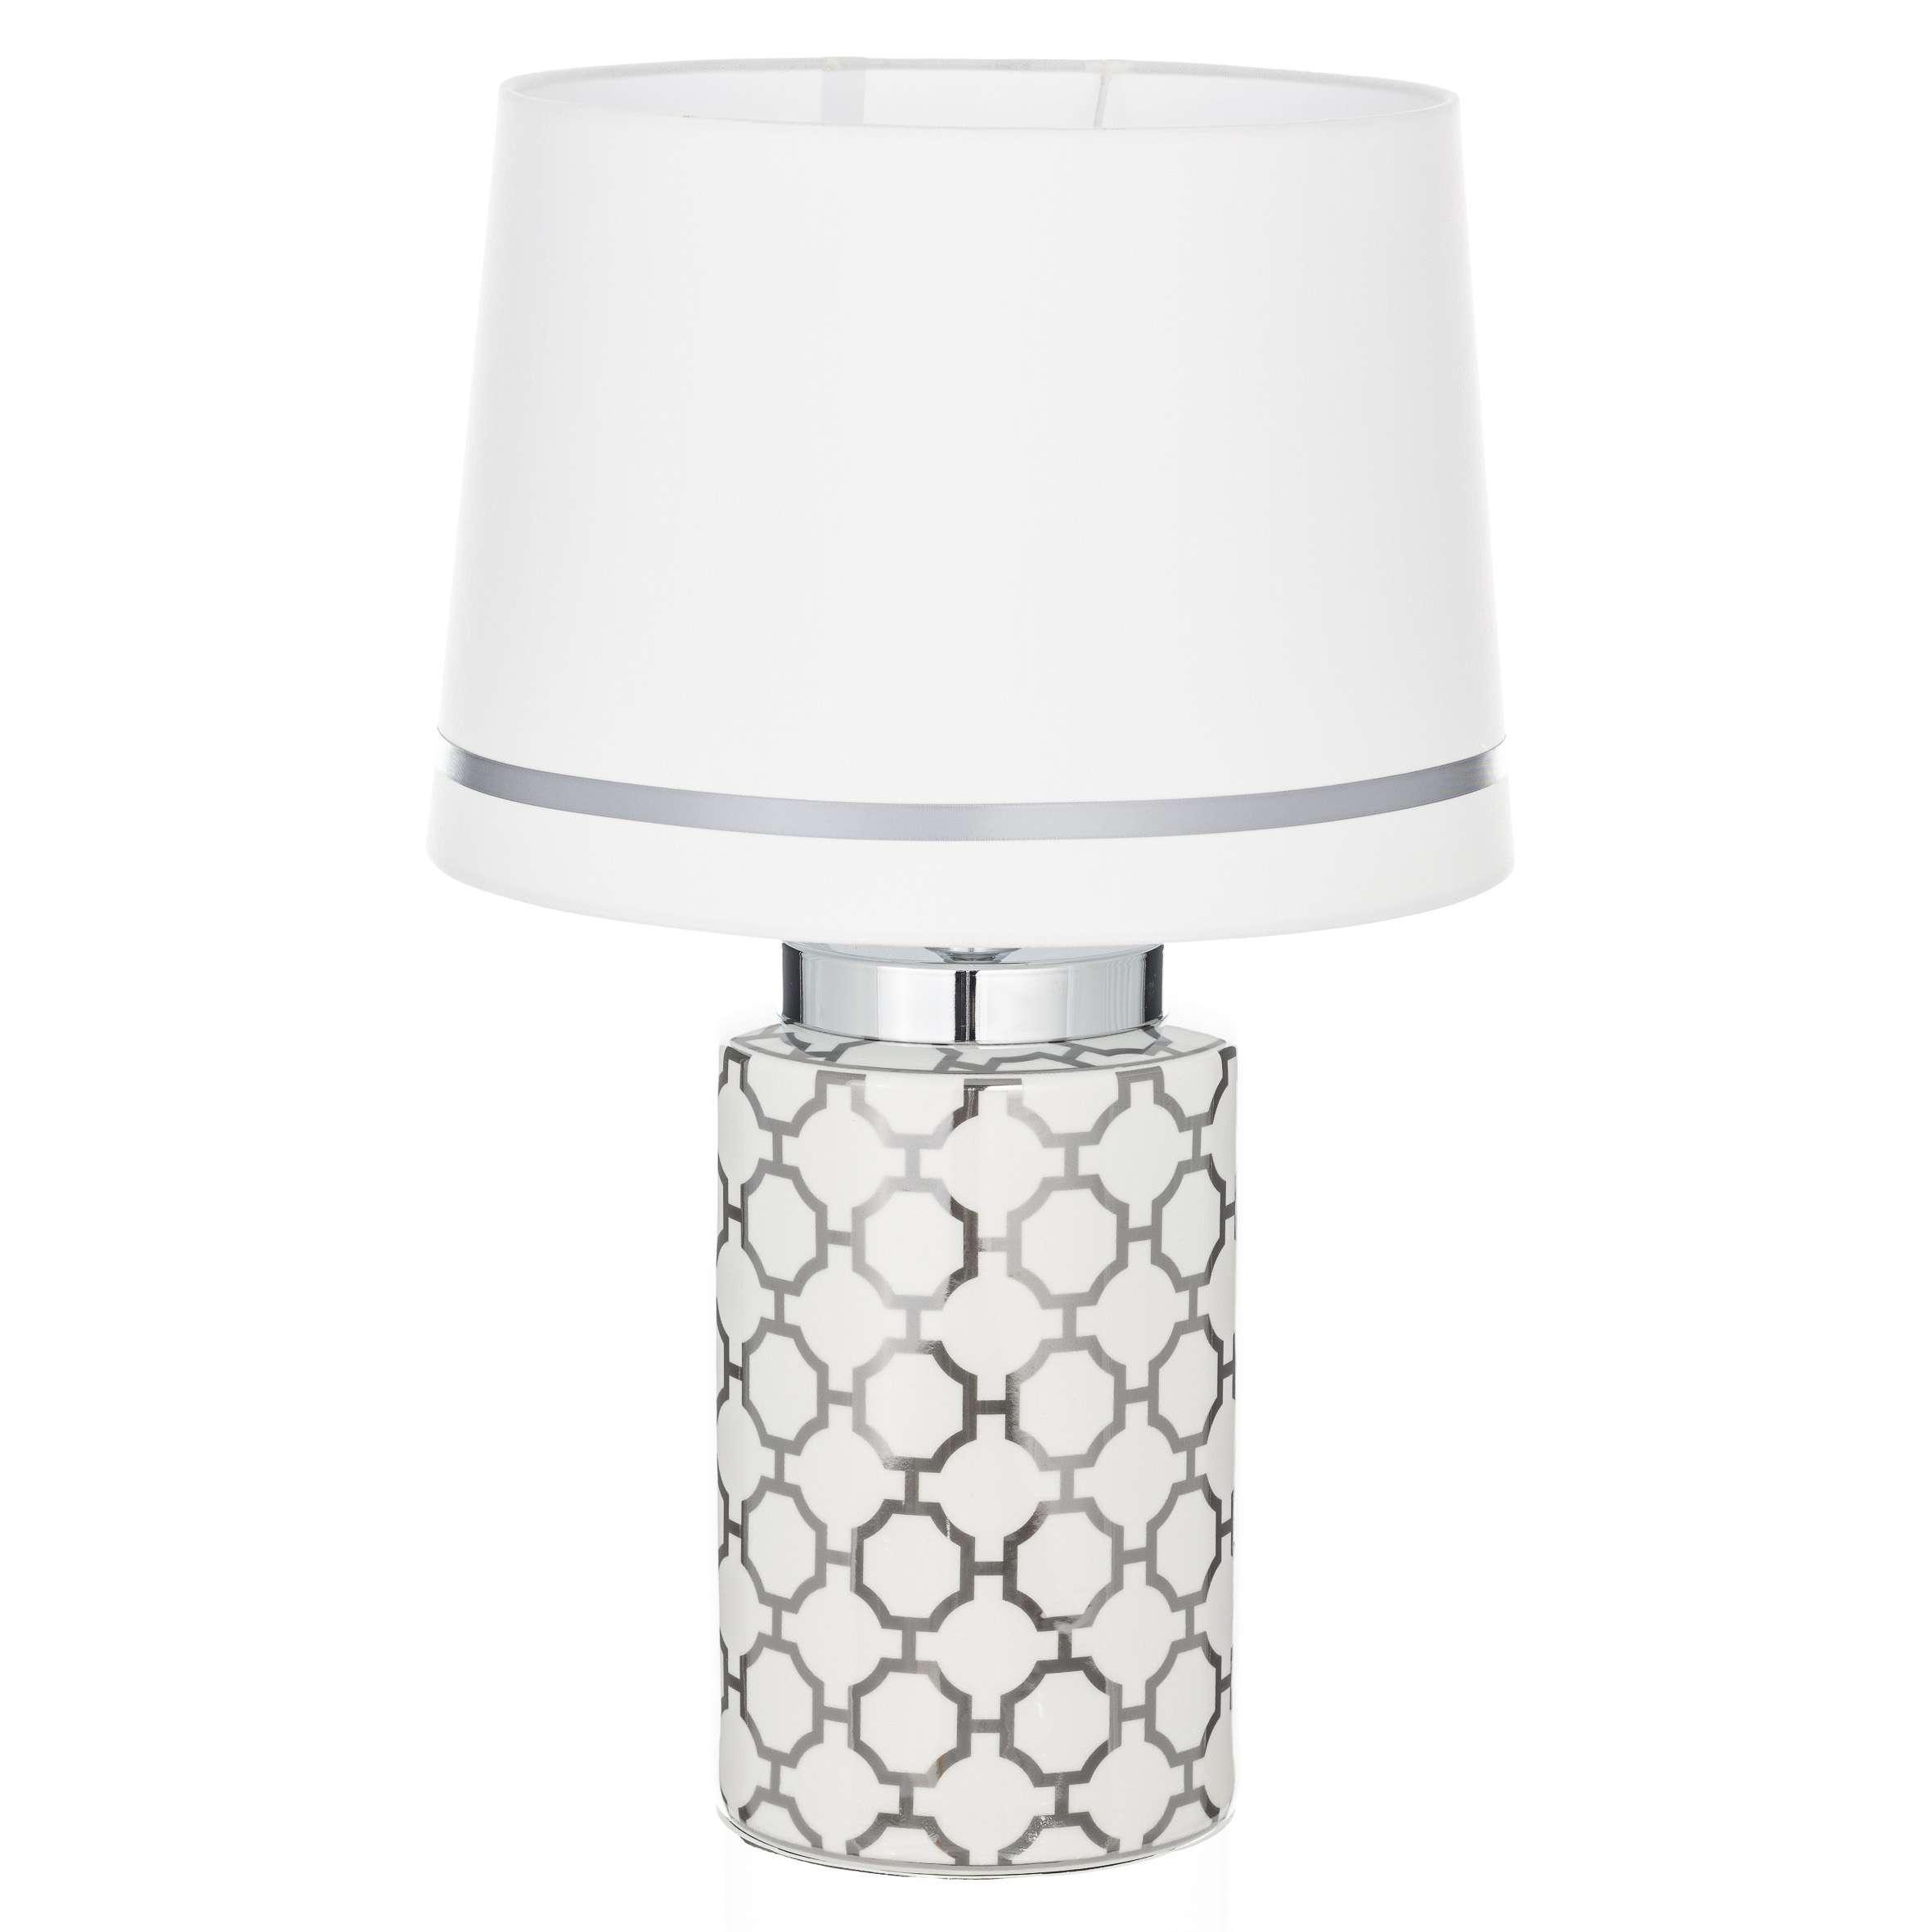 Tafellamp Akina